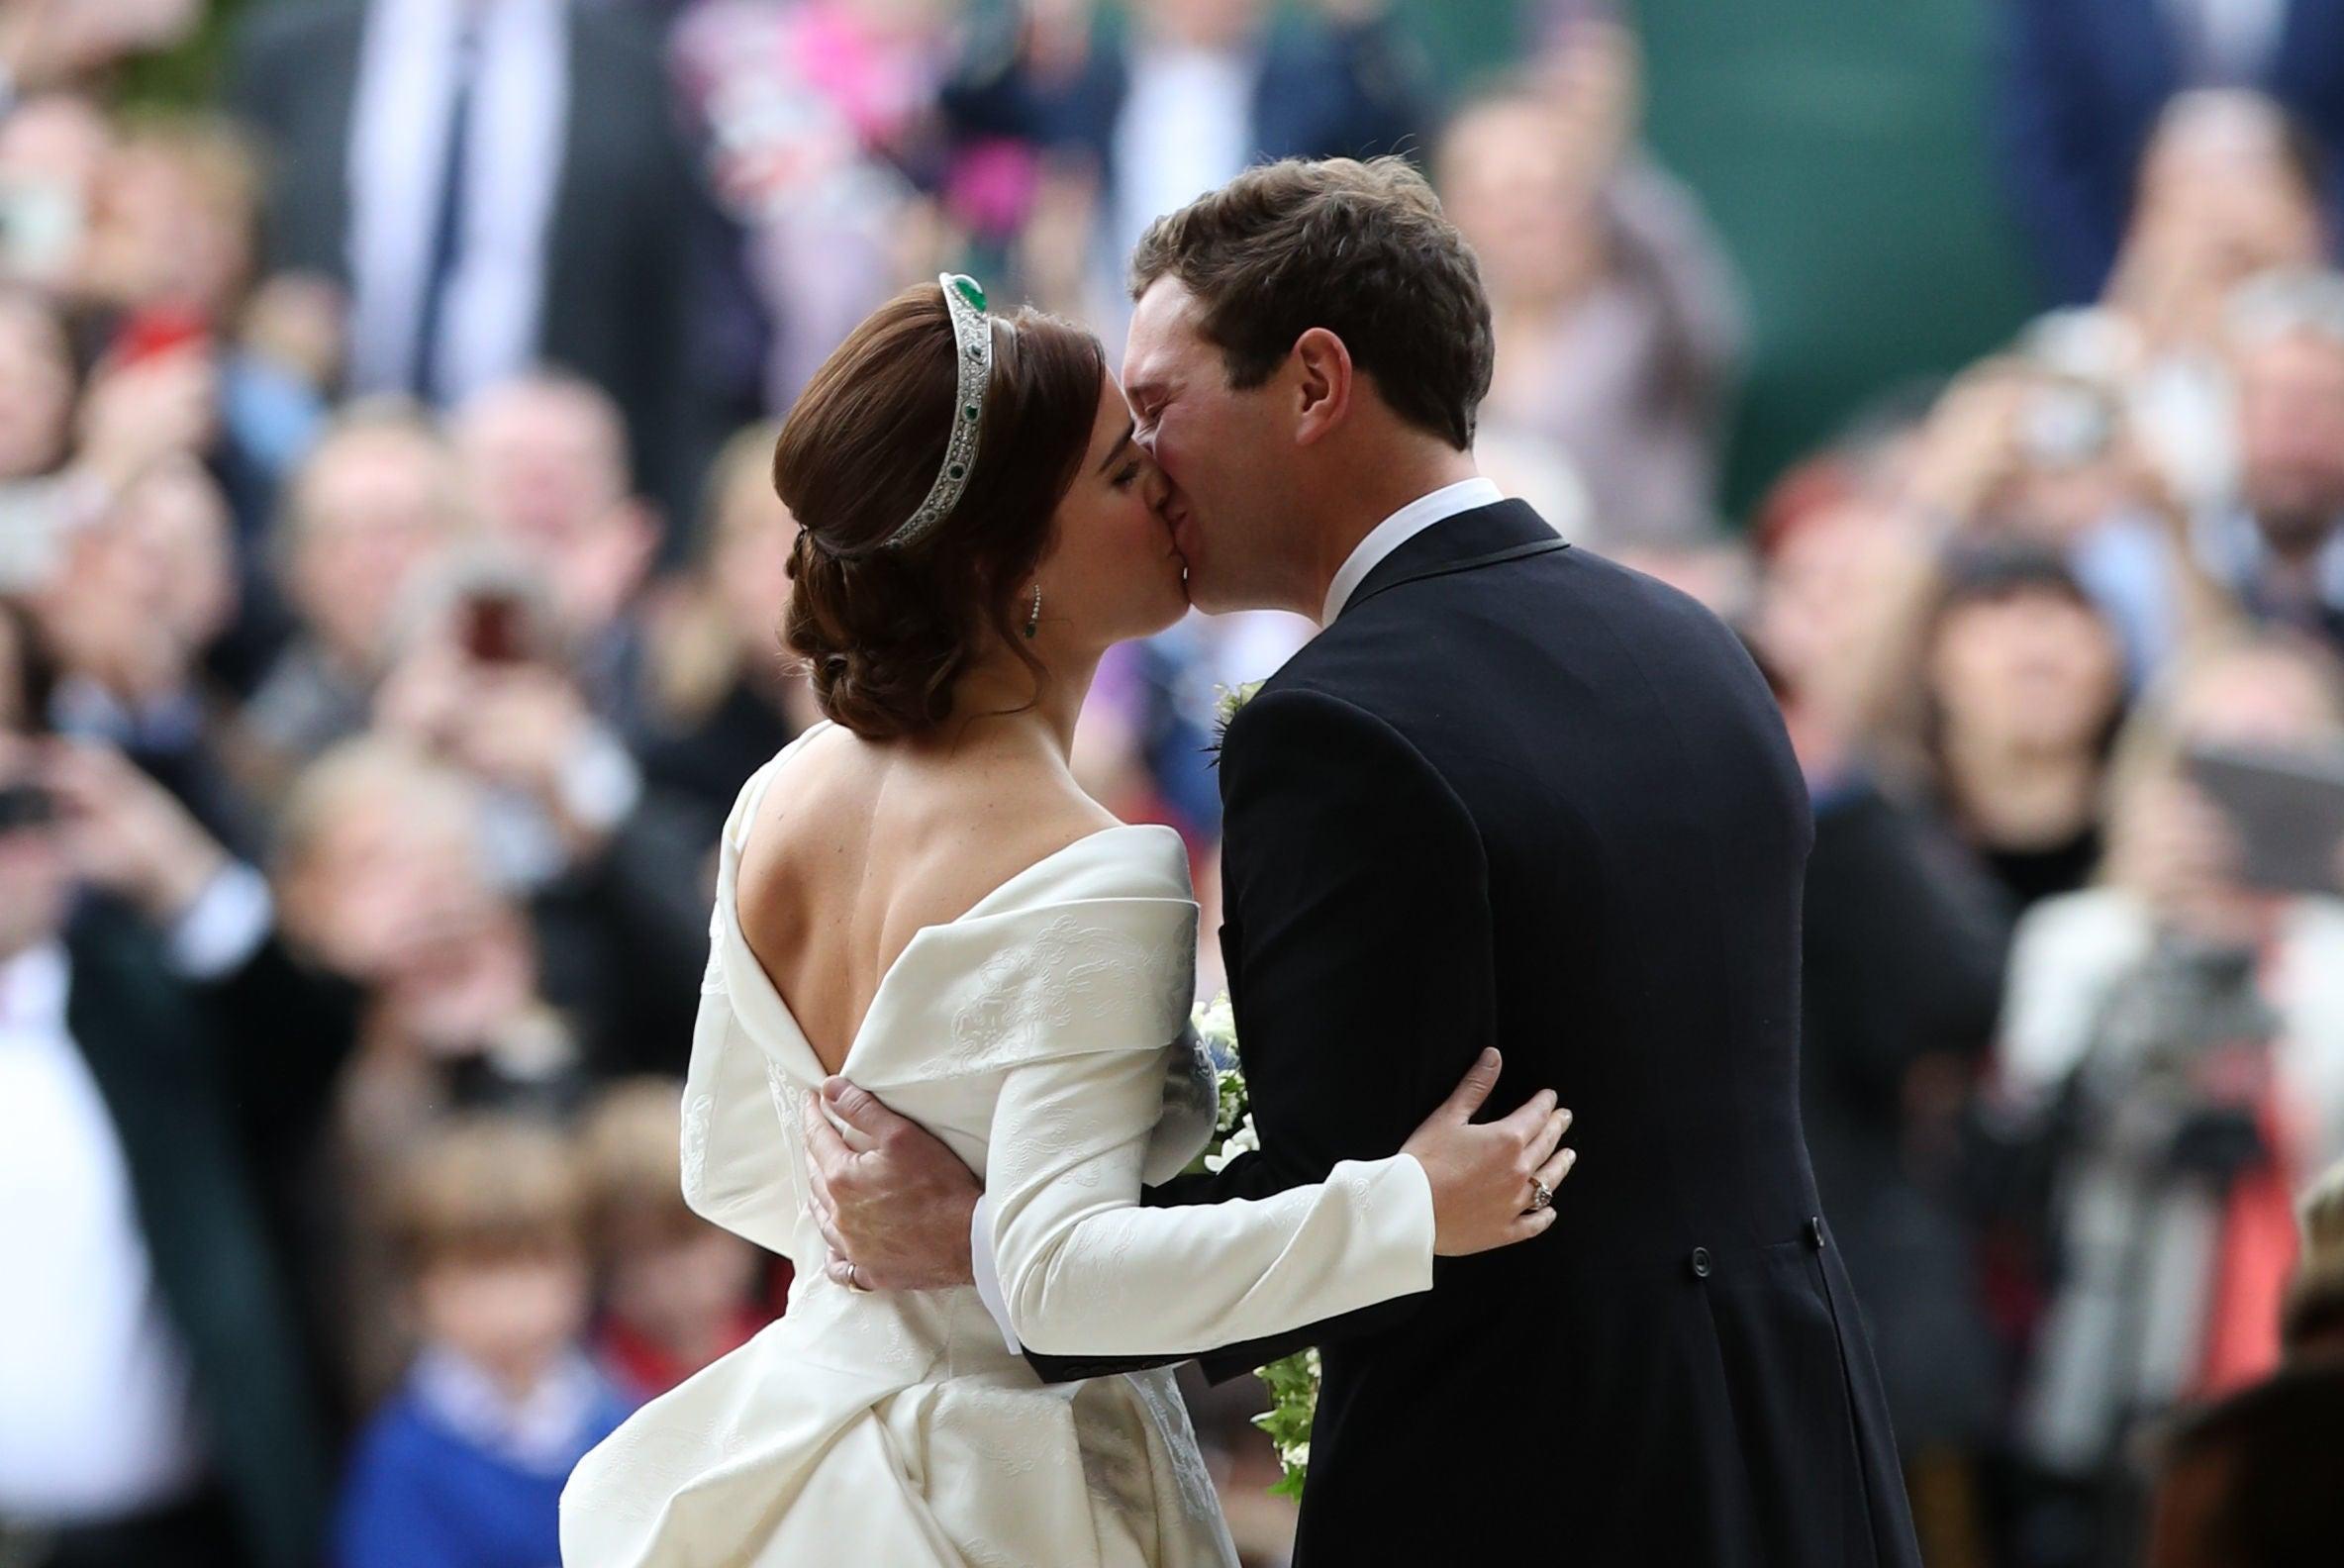 Royal wedding: Princess Eugenie chooses same makeup artist